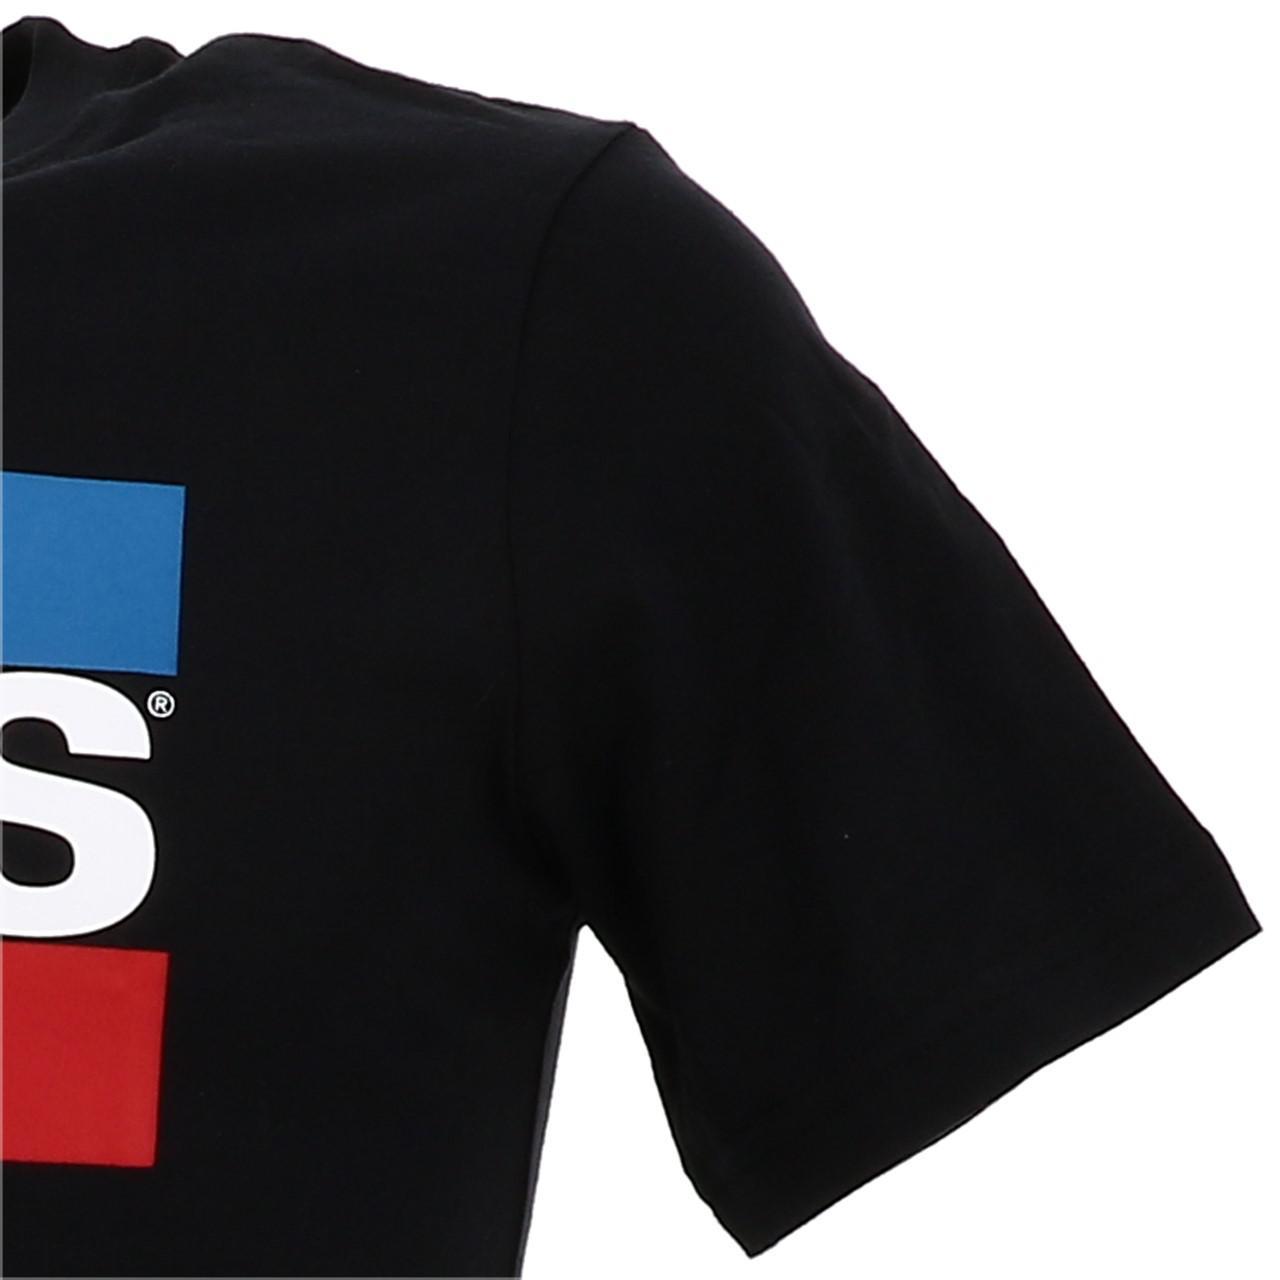 Tee-shirt-manches-courtes-Levis-Hero-black-mc-tee-jr-Noir-19324-Neuf miniature 3